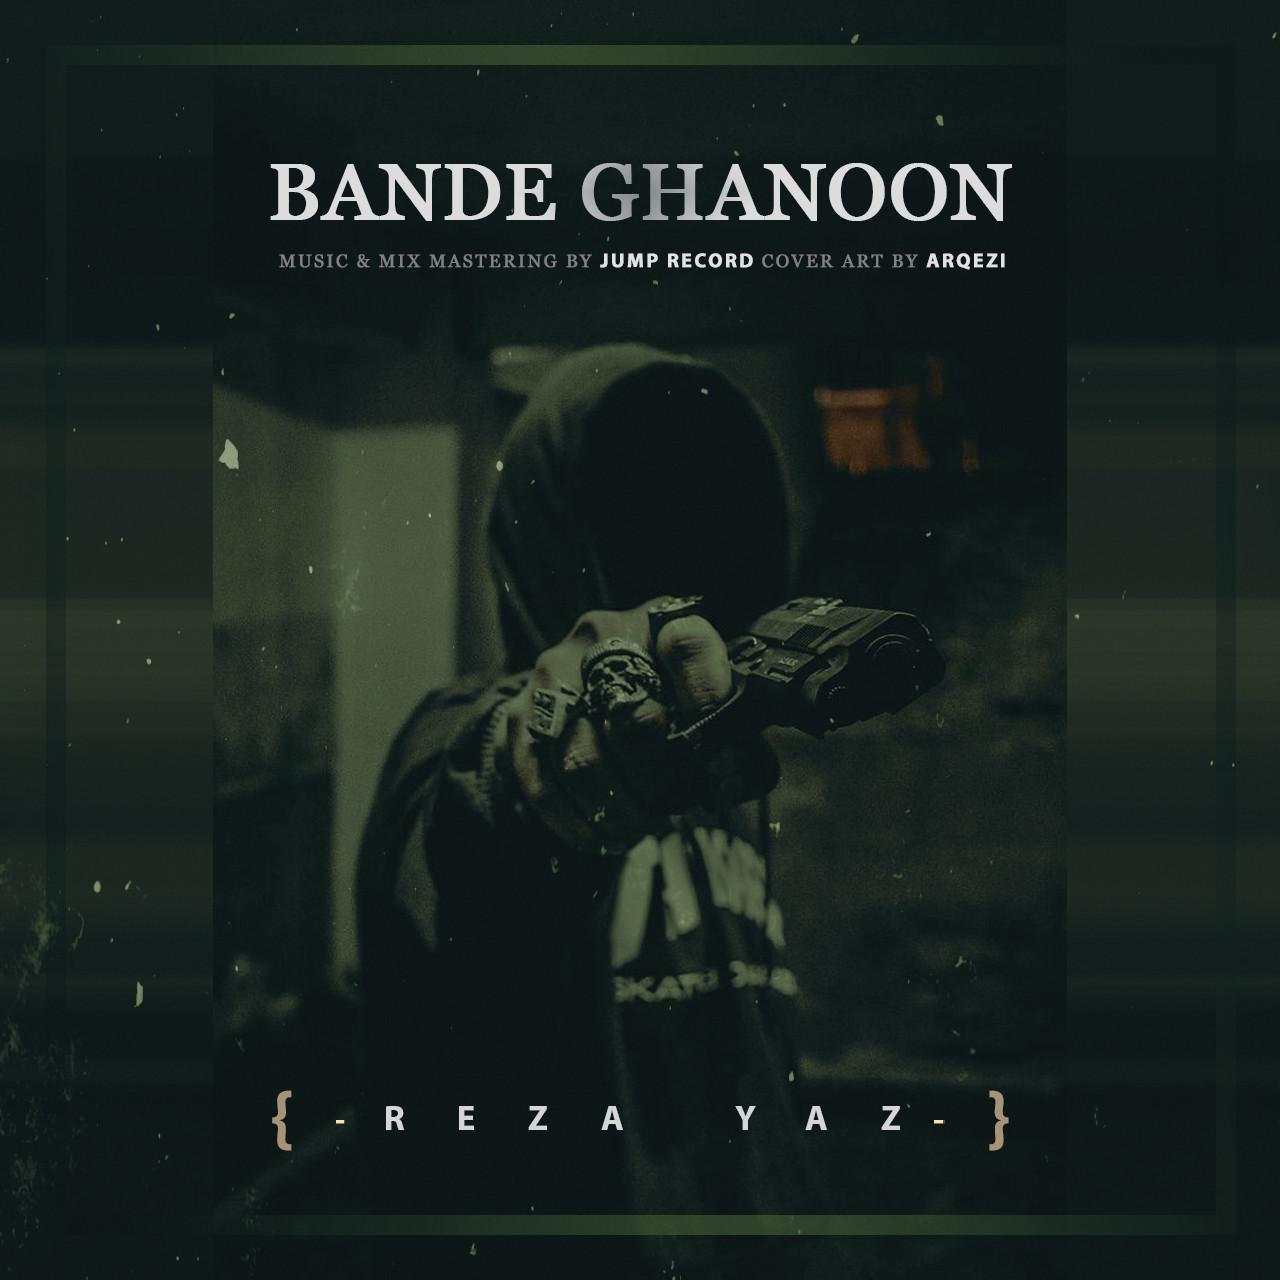 Reza Yaz - Bande Ghanoon